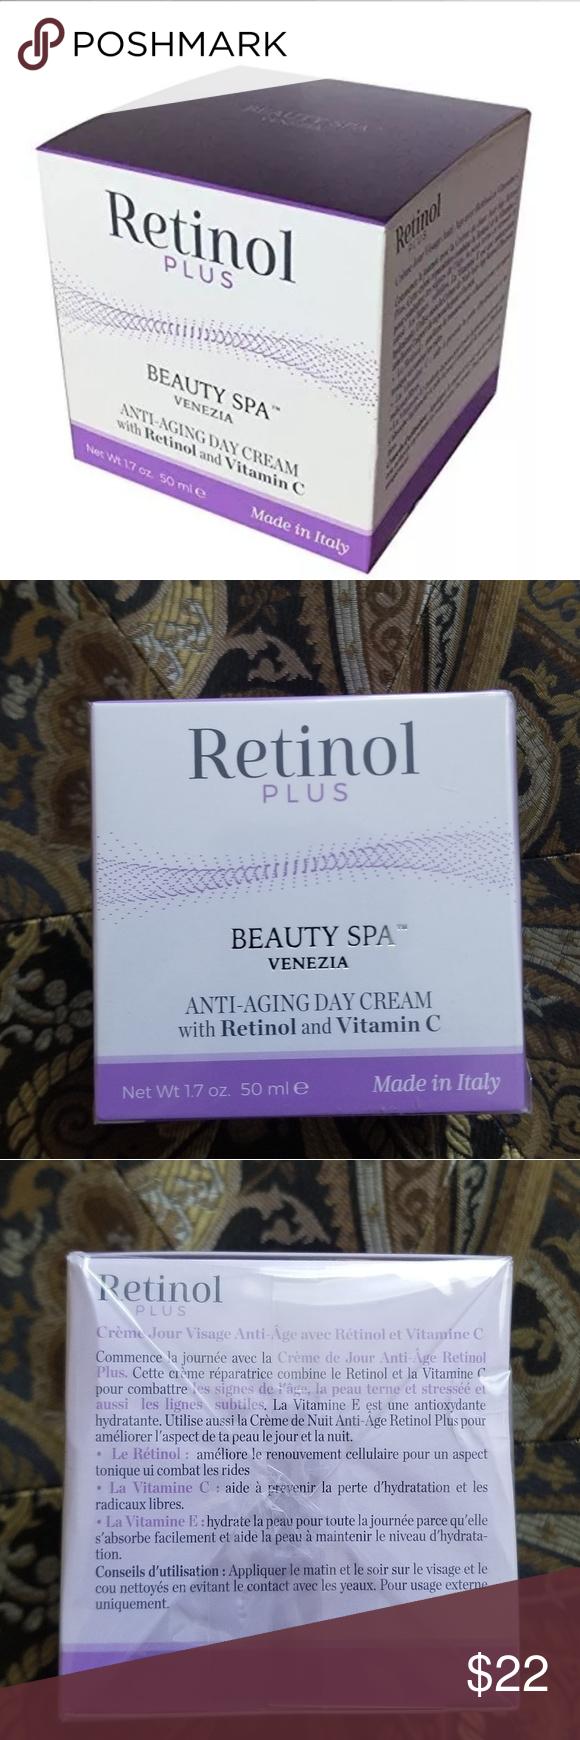 Retinol Anti Aging Day Cream W Retinol And Vit C Retinol Beauty Spa Anti Aging